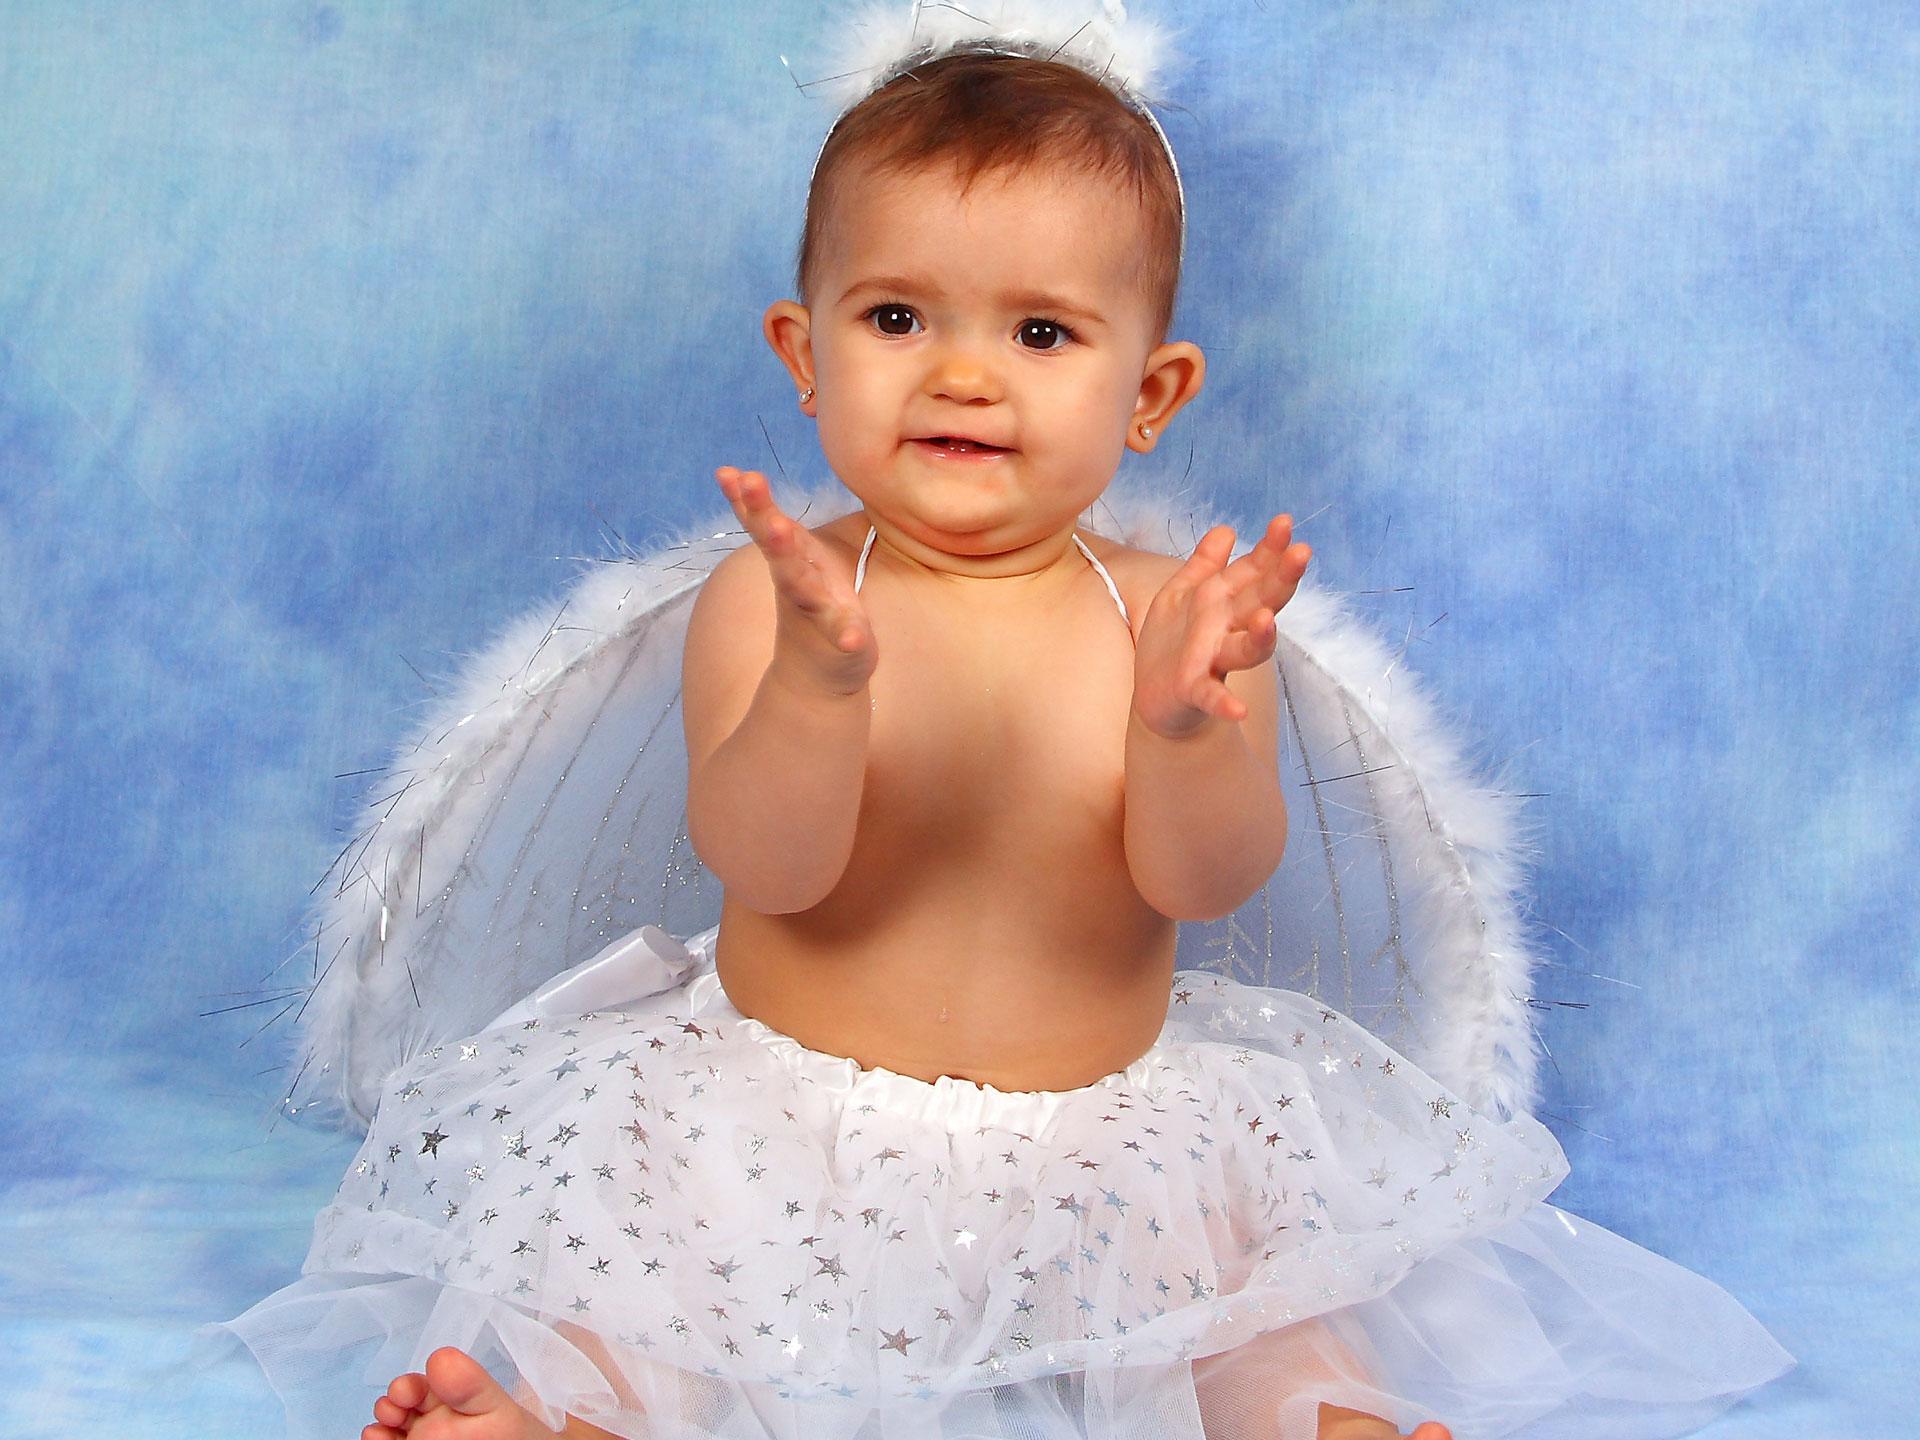 Ccute angel baby girl normal